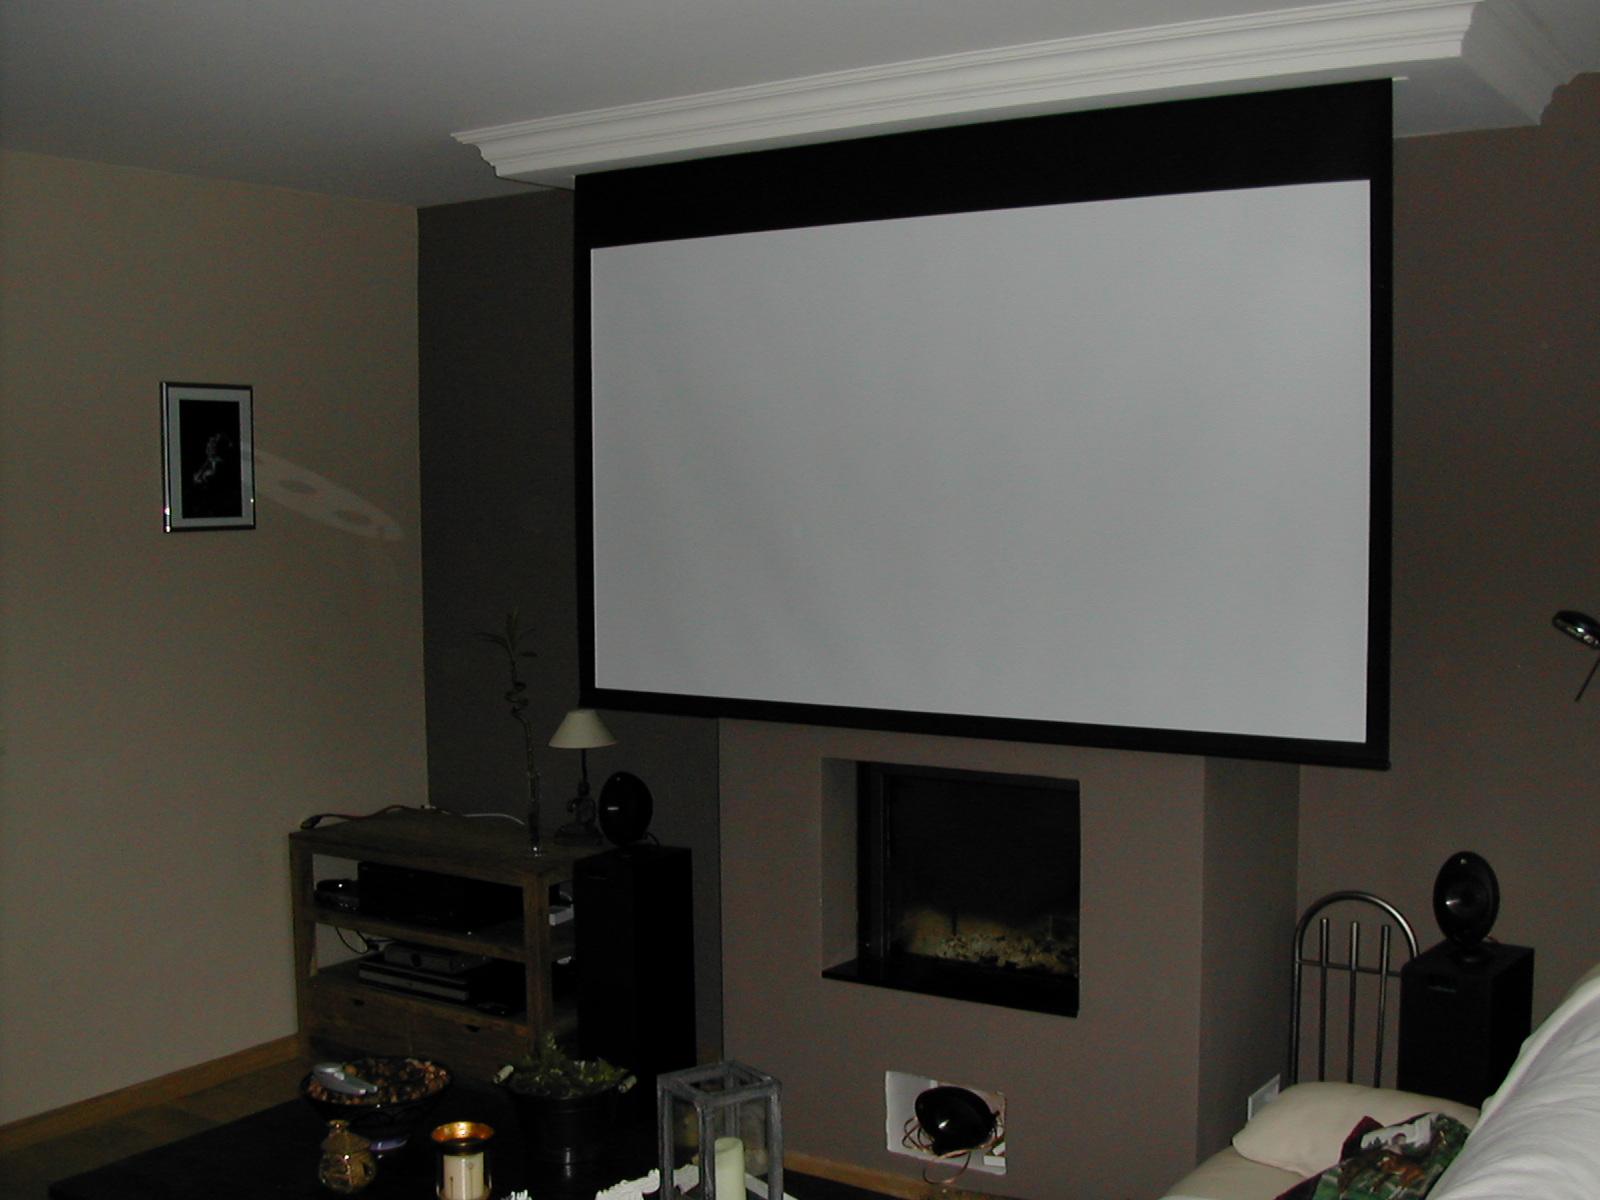 salon hifi et salle hc d di s de djdactylo fini p7 29869566 sur le forum installations. Black Bedroom Furniture Sets. Home Design Ideas